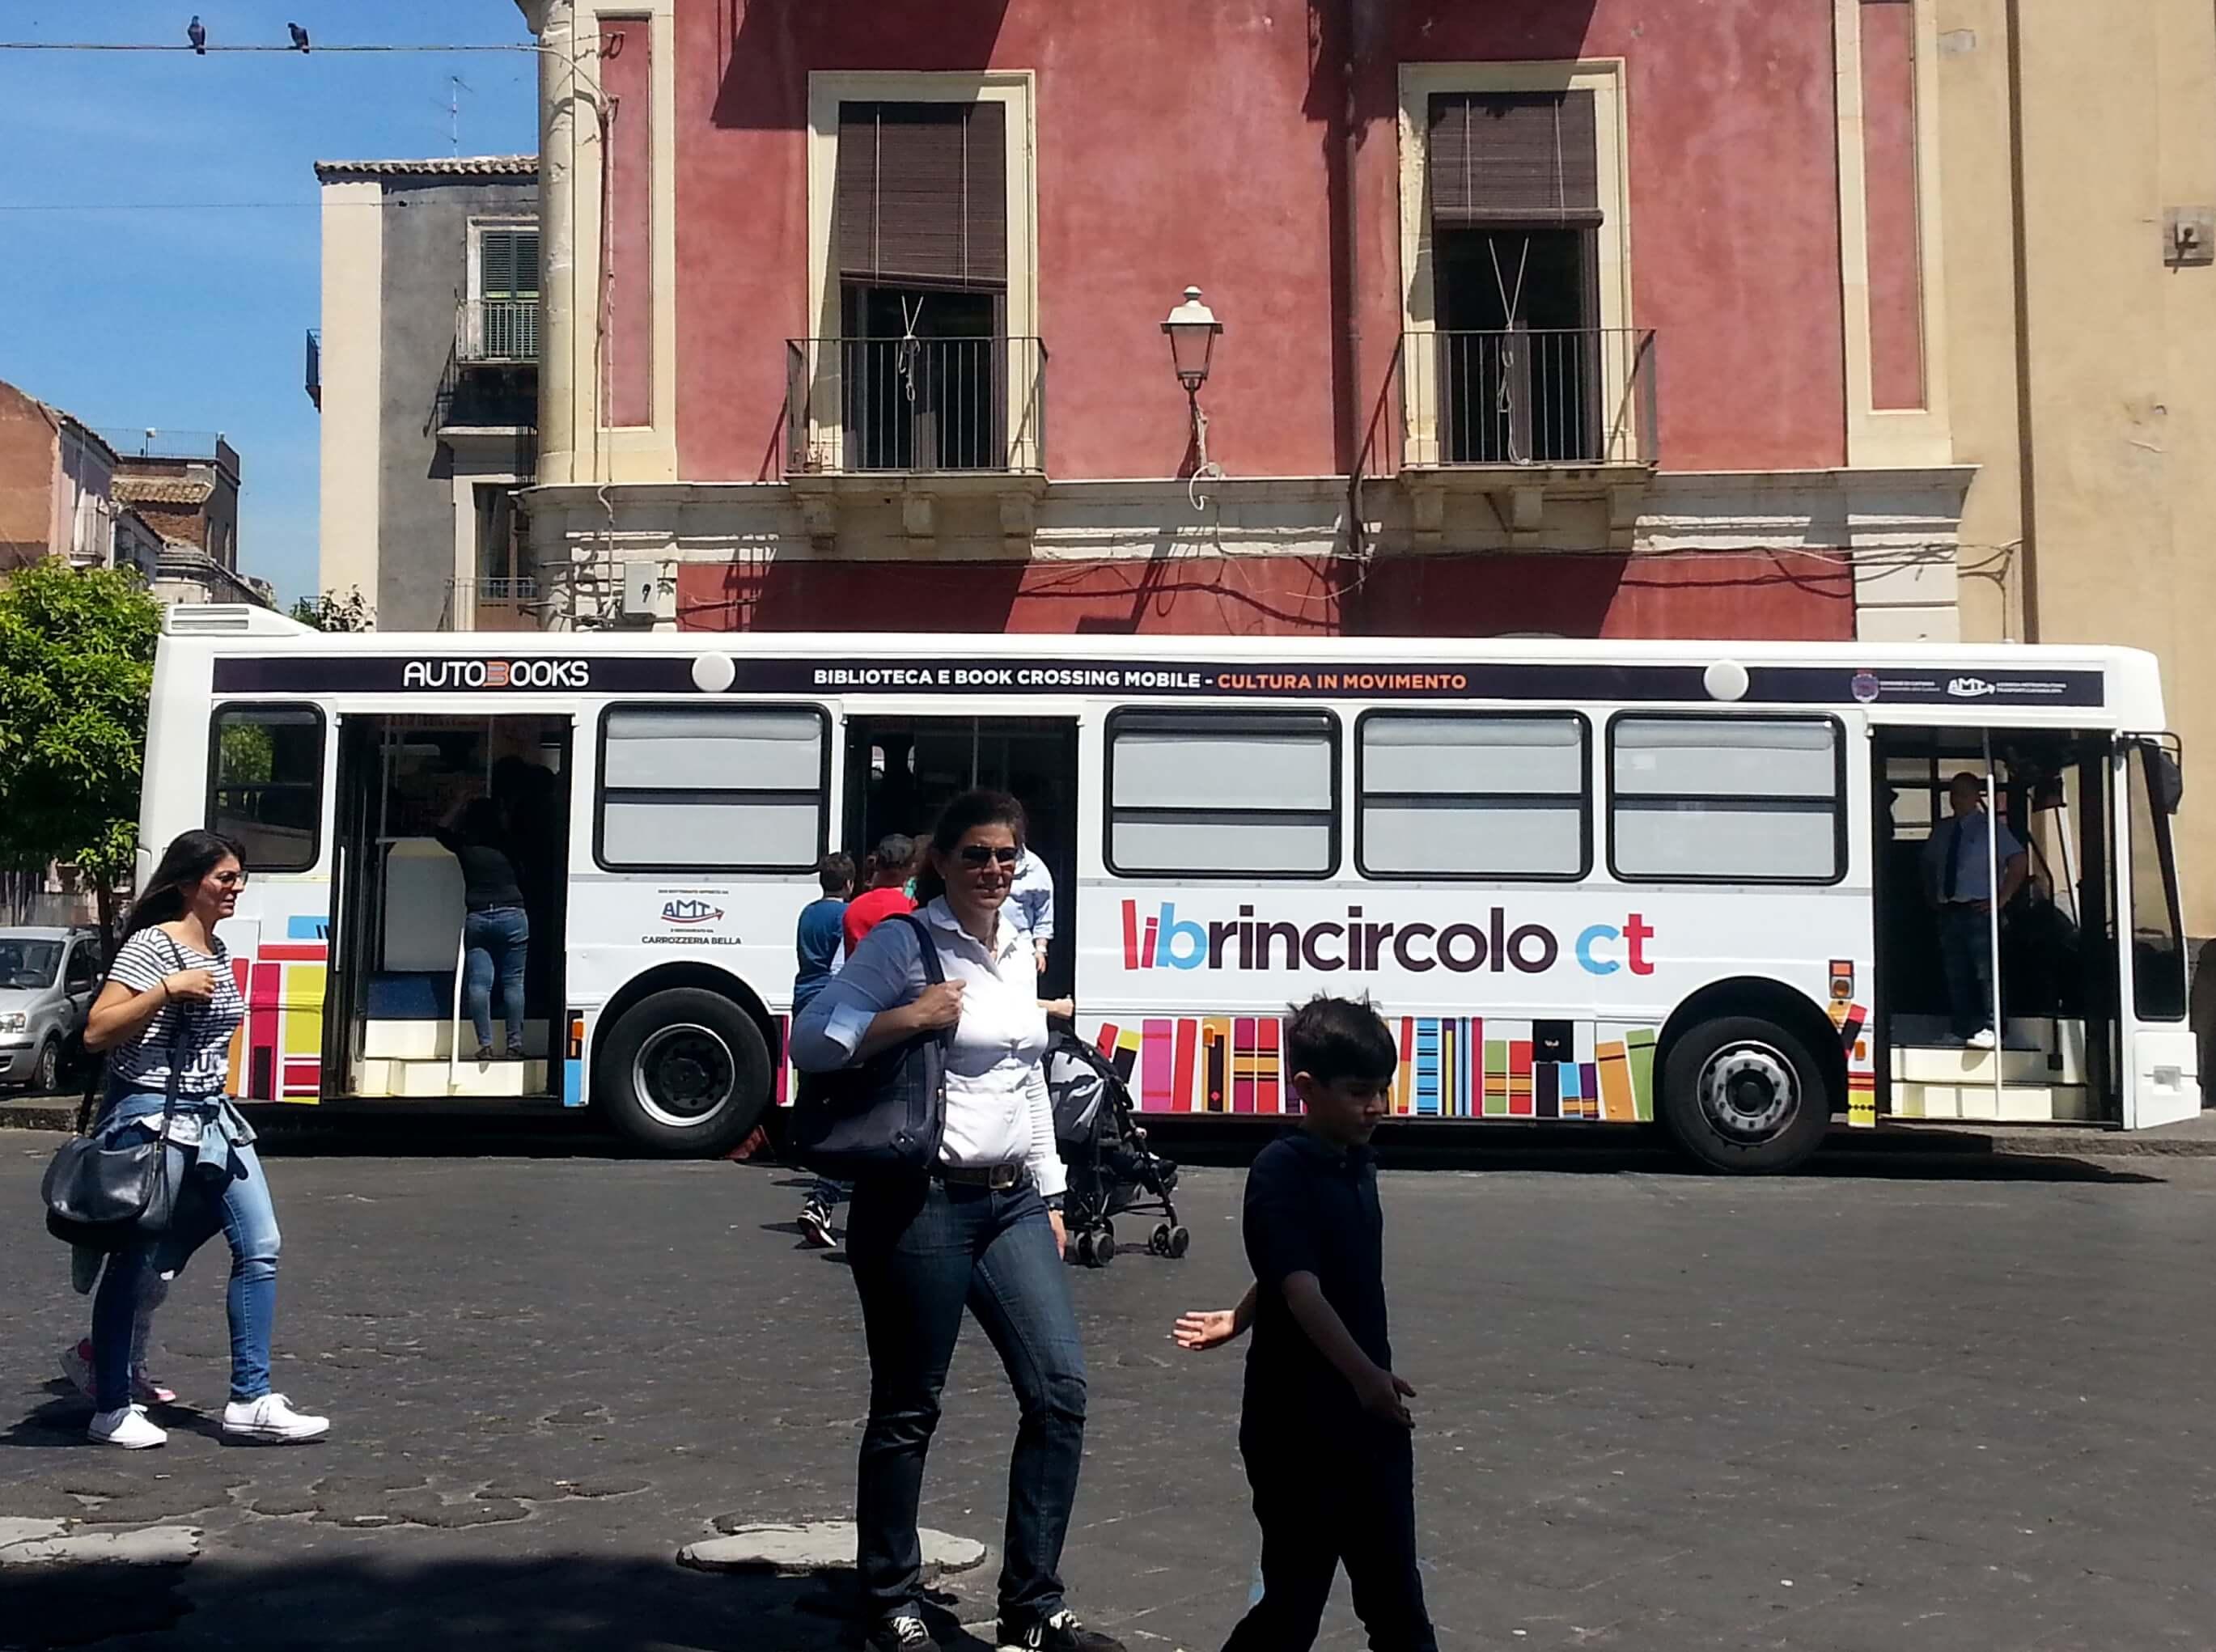 Catania_Librincircolo